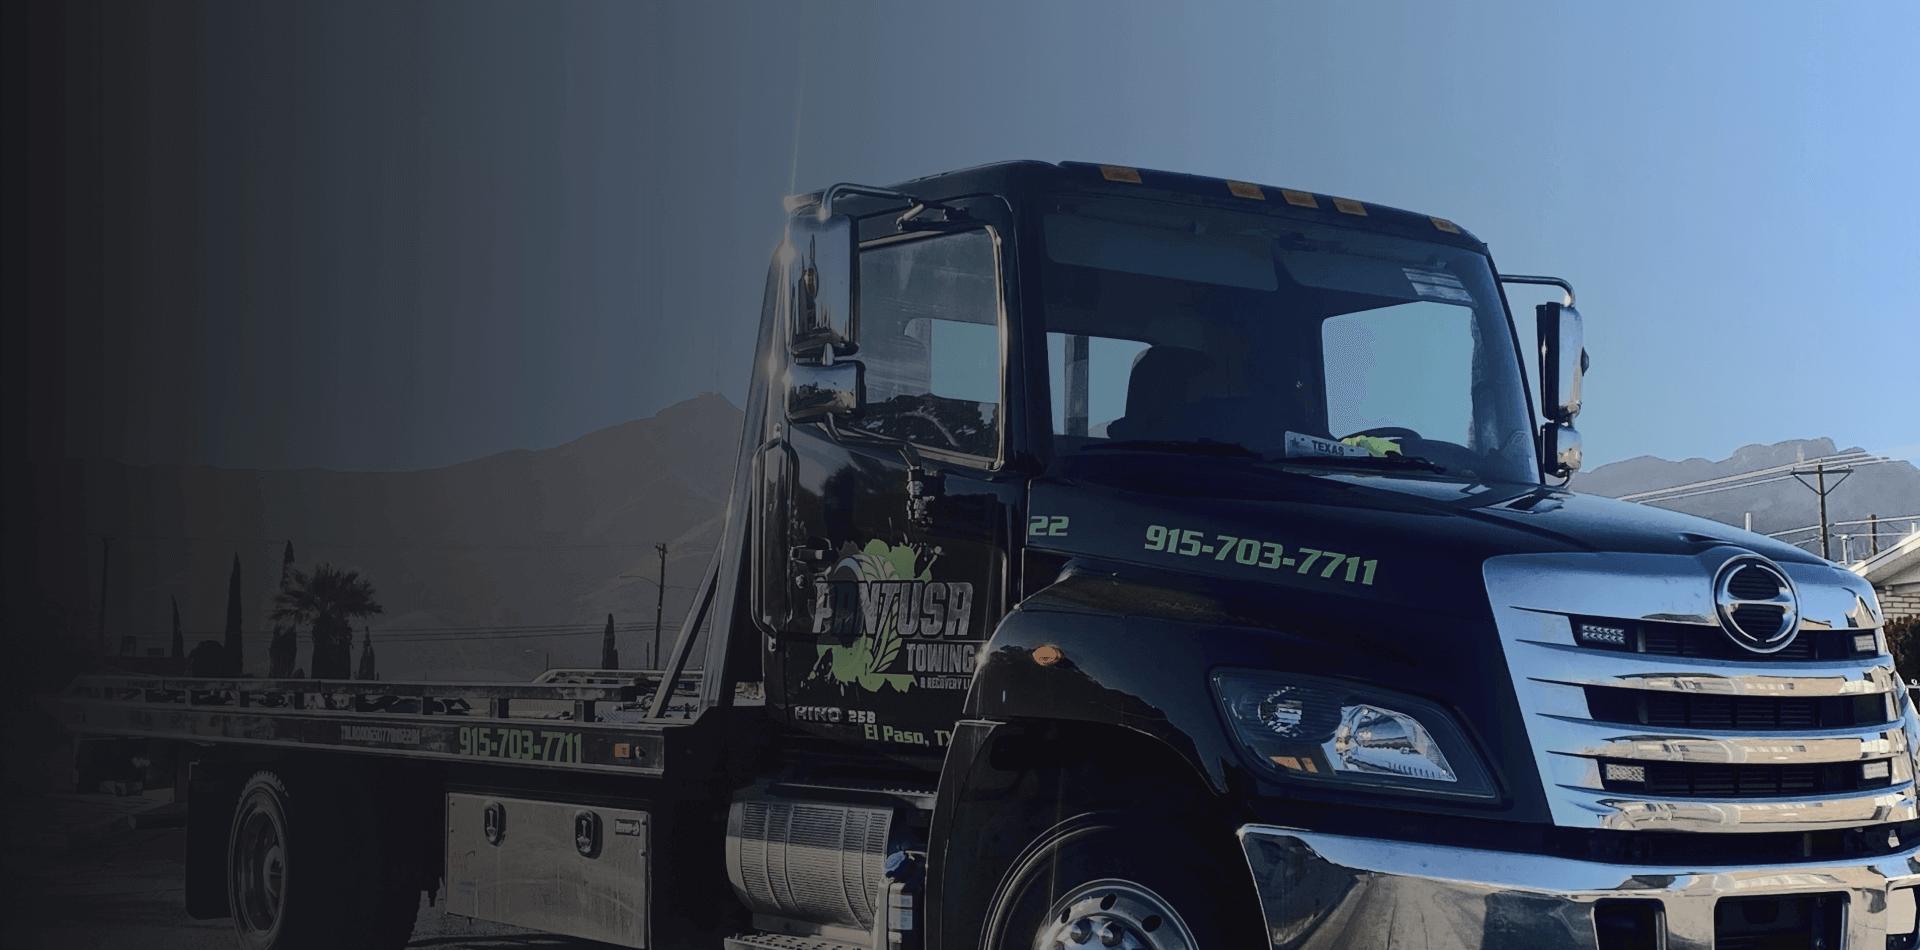 Need a Haul? – Trucking + Hauling